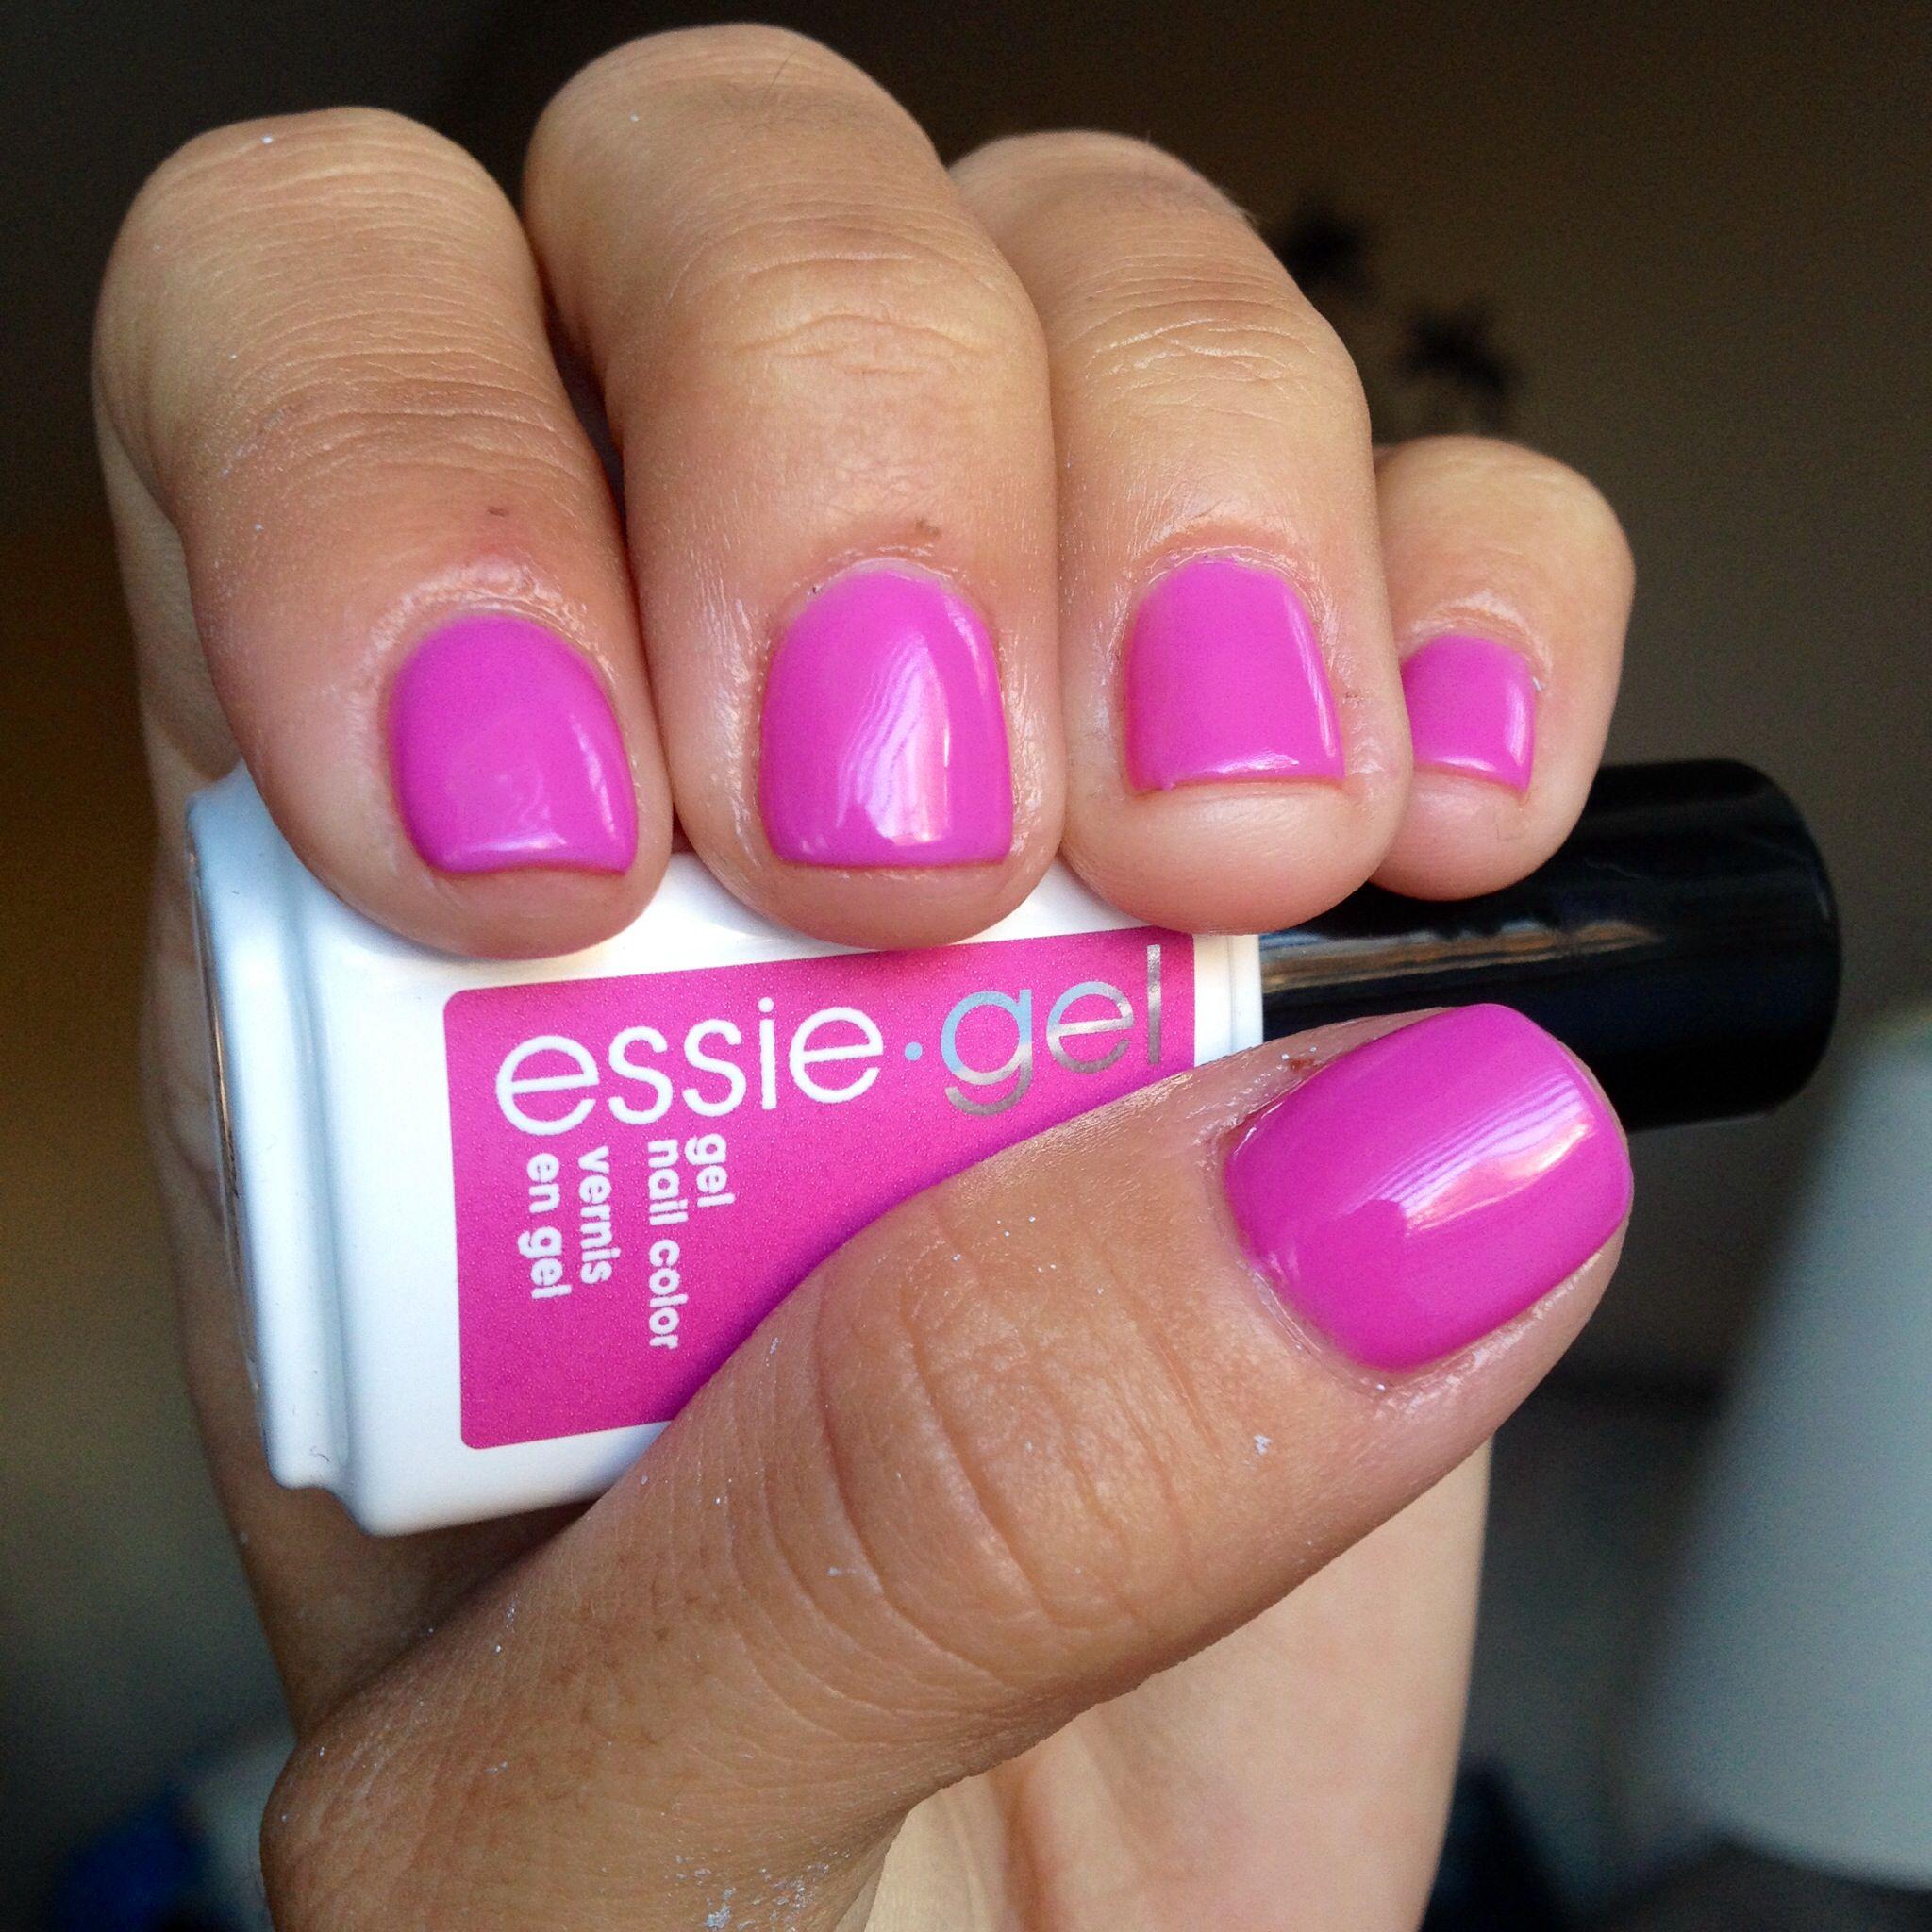 Essie Gel- Frangipani | NAILS! | Pinterest